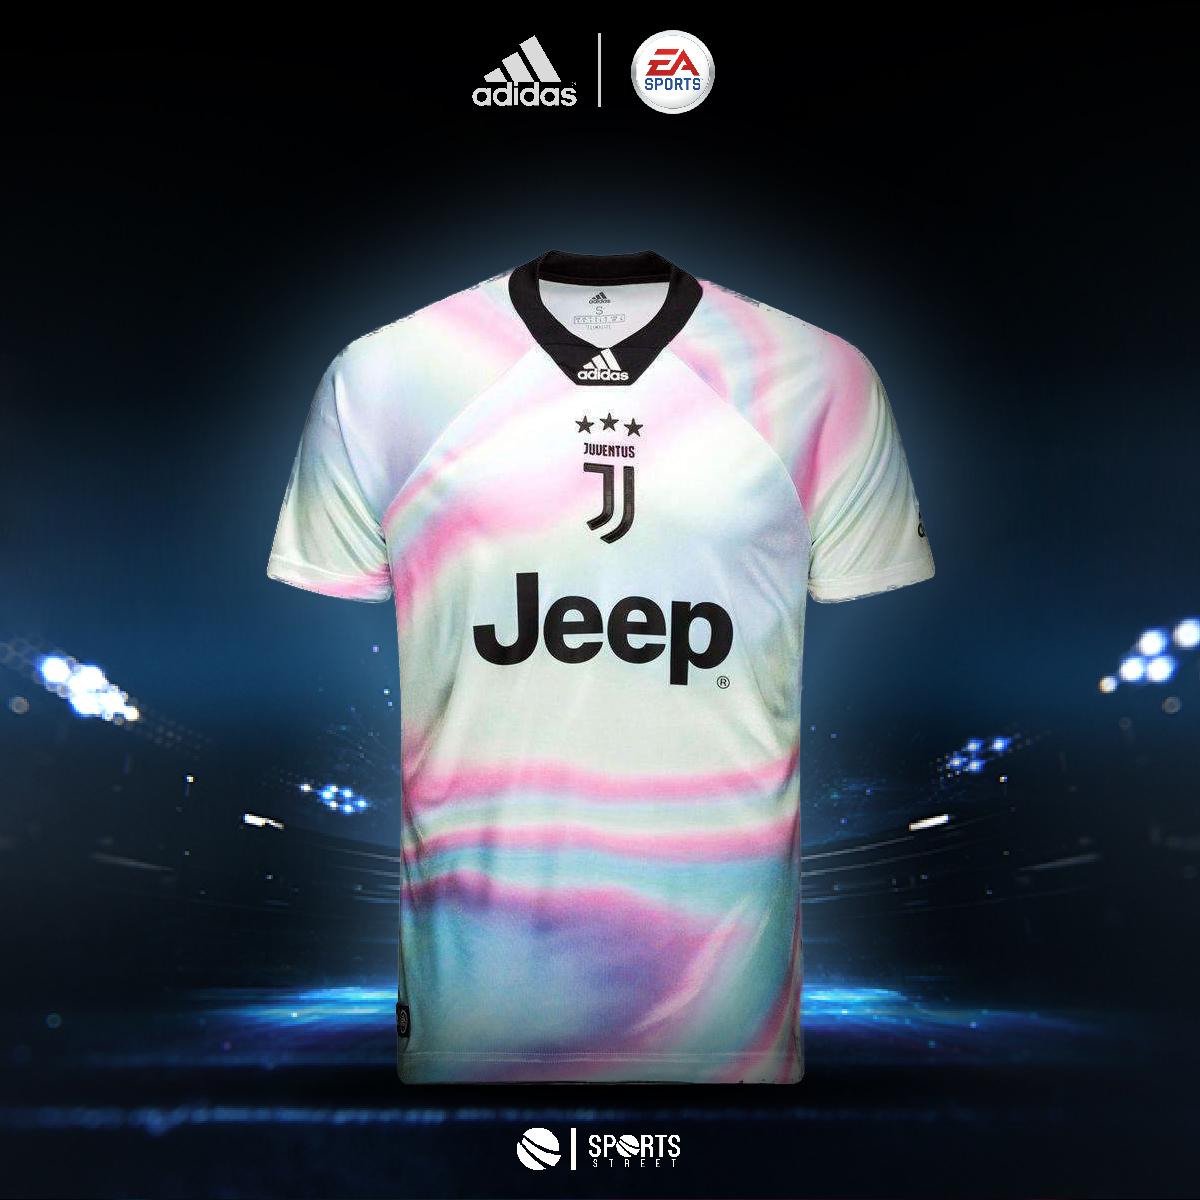 866a74dd7 Juventus EA Sports Jersey 18/19